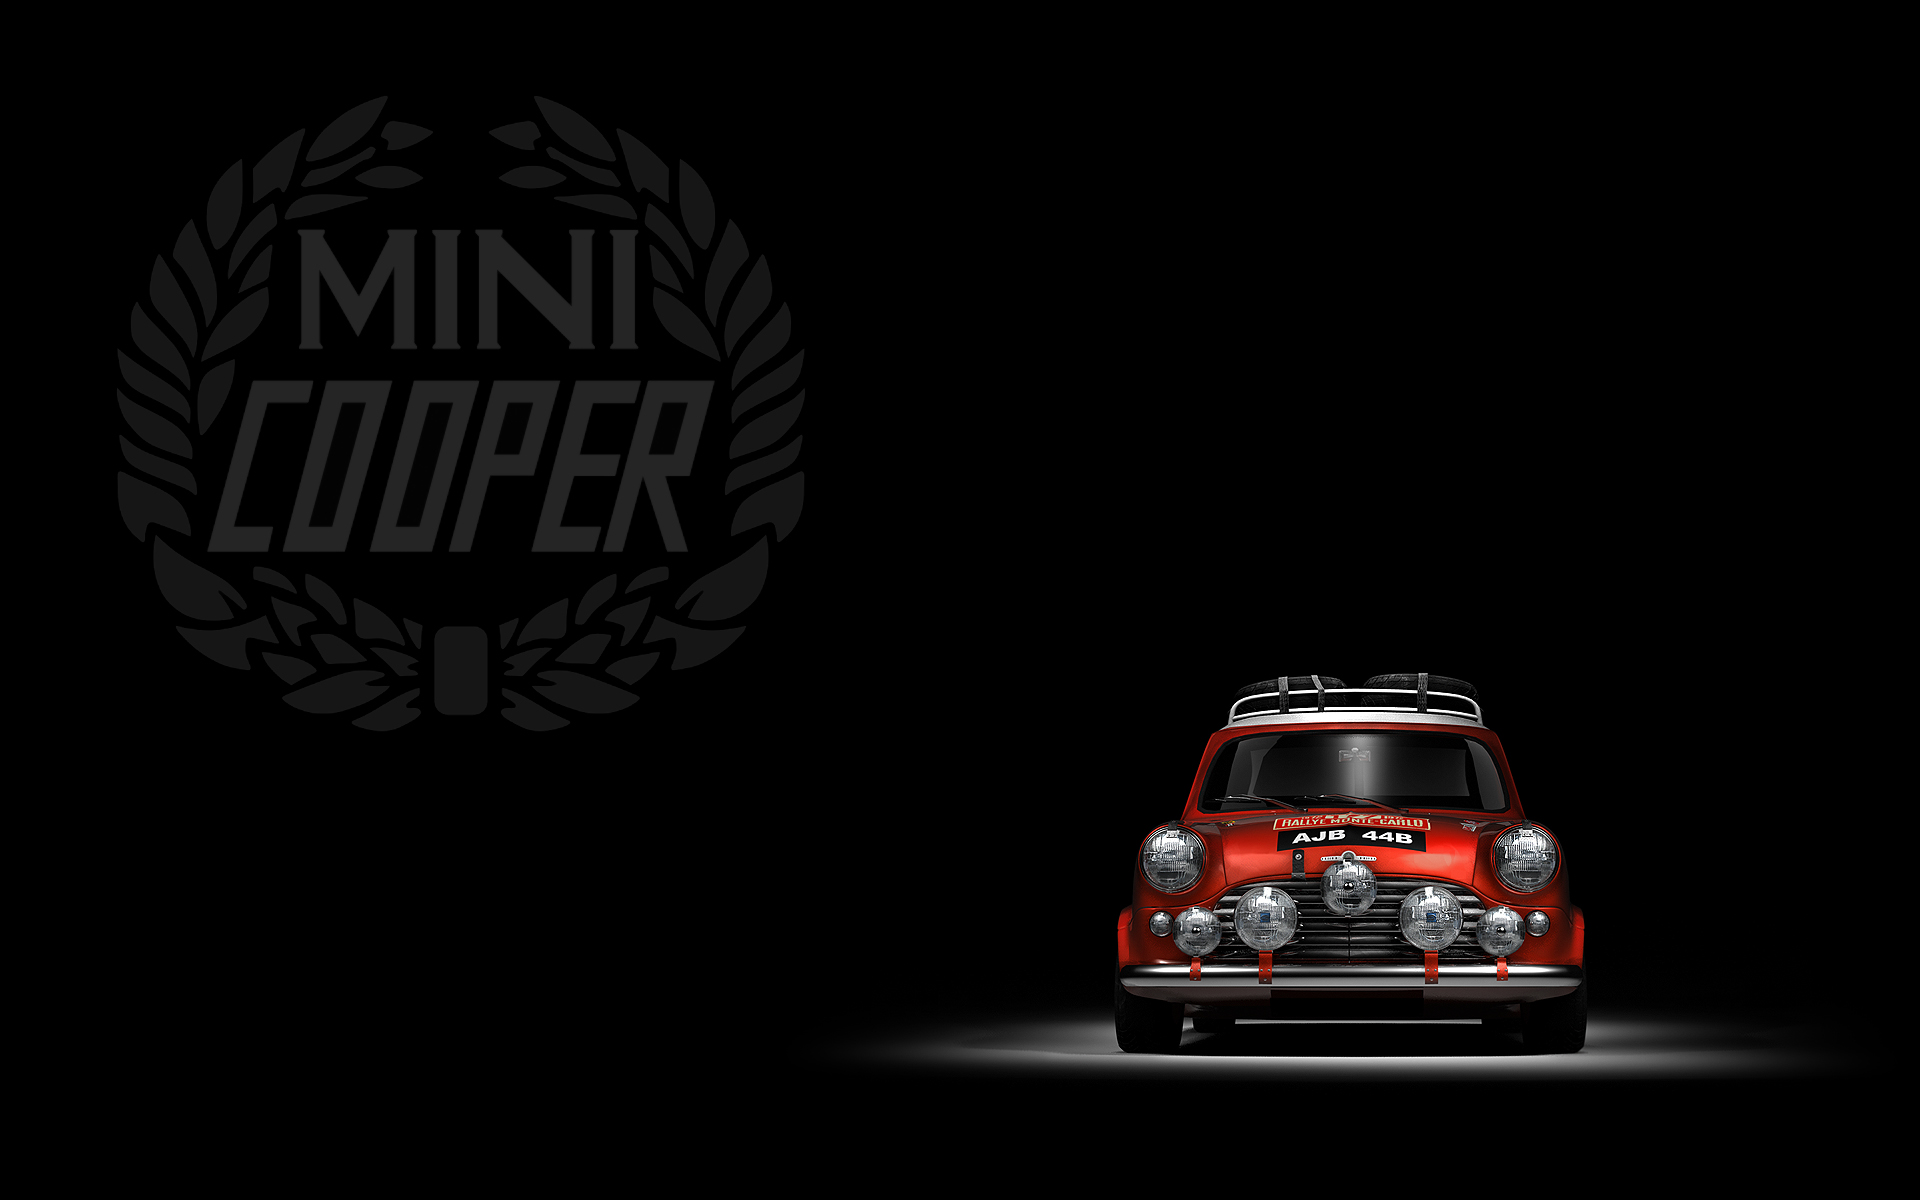 Pc Mini Cooper Wallpapers Renard Drew